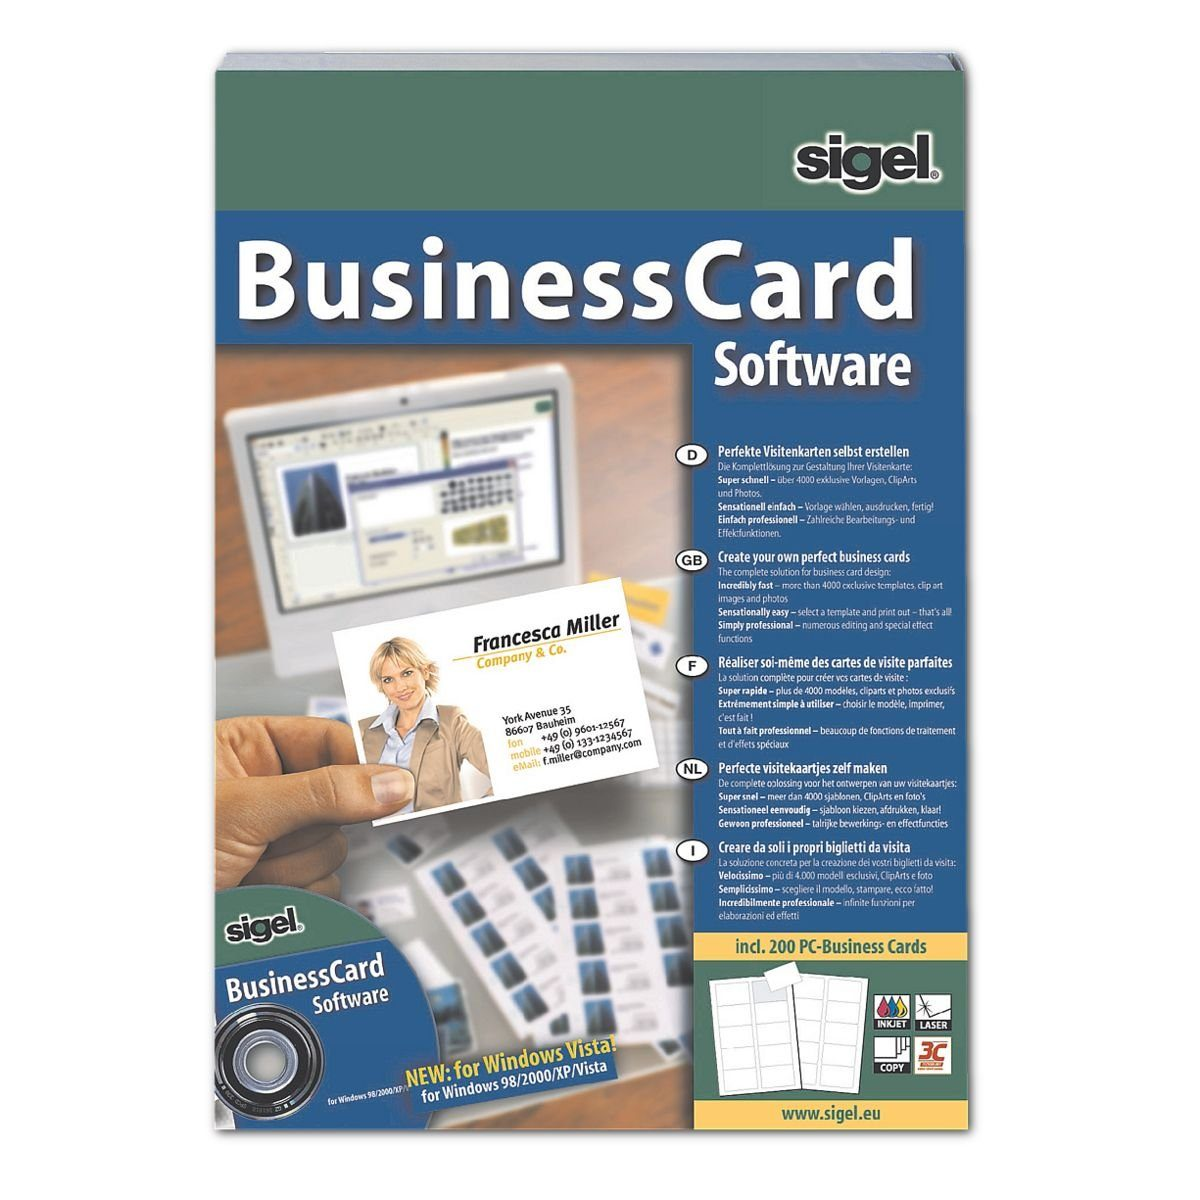 Sigel BusinessCard Software SW670, Software für Visitenkarten